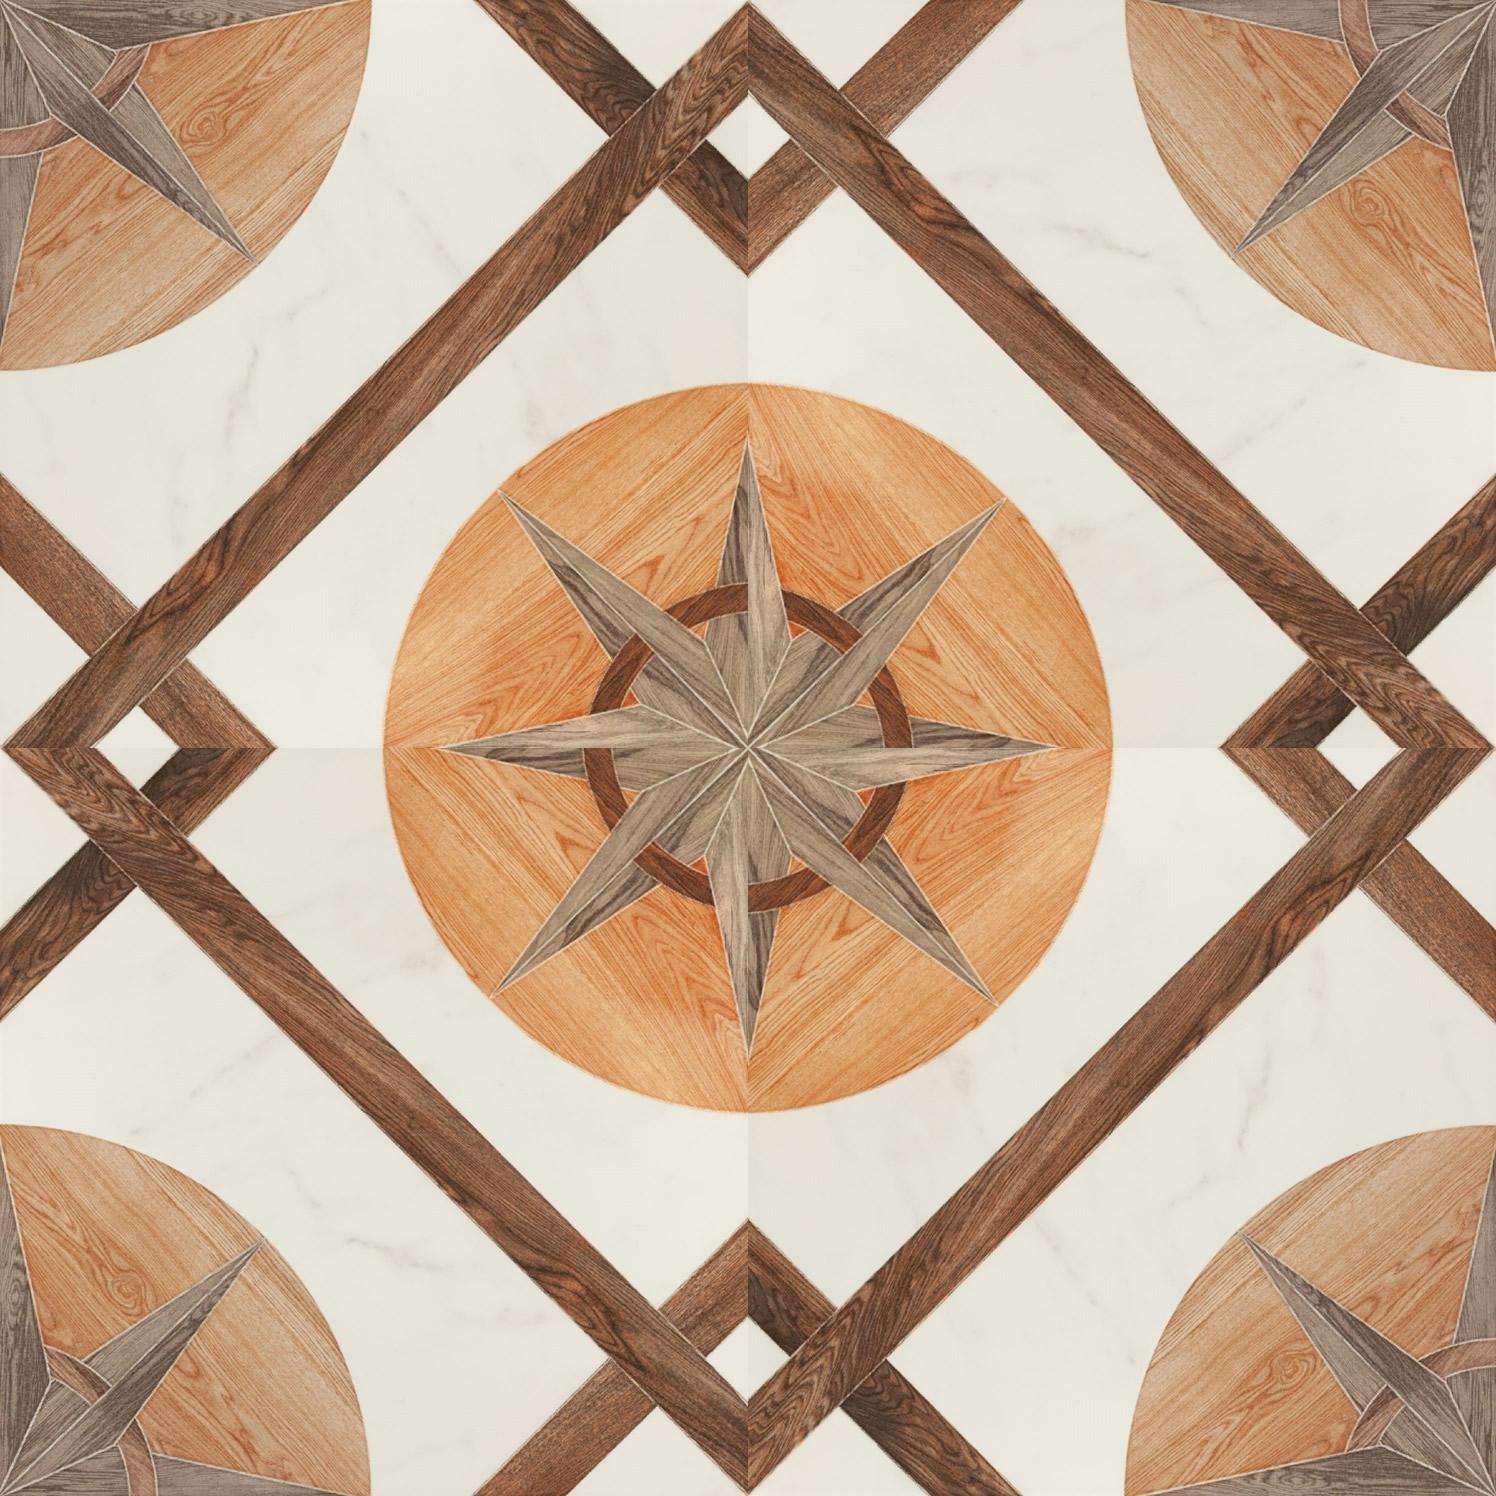 Maderas ceramicentro for Figuras en pisos ceramicos